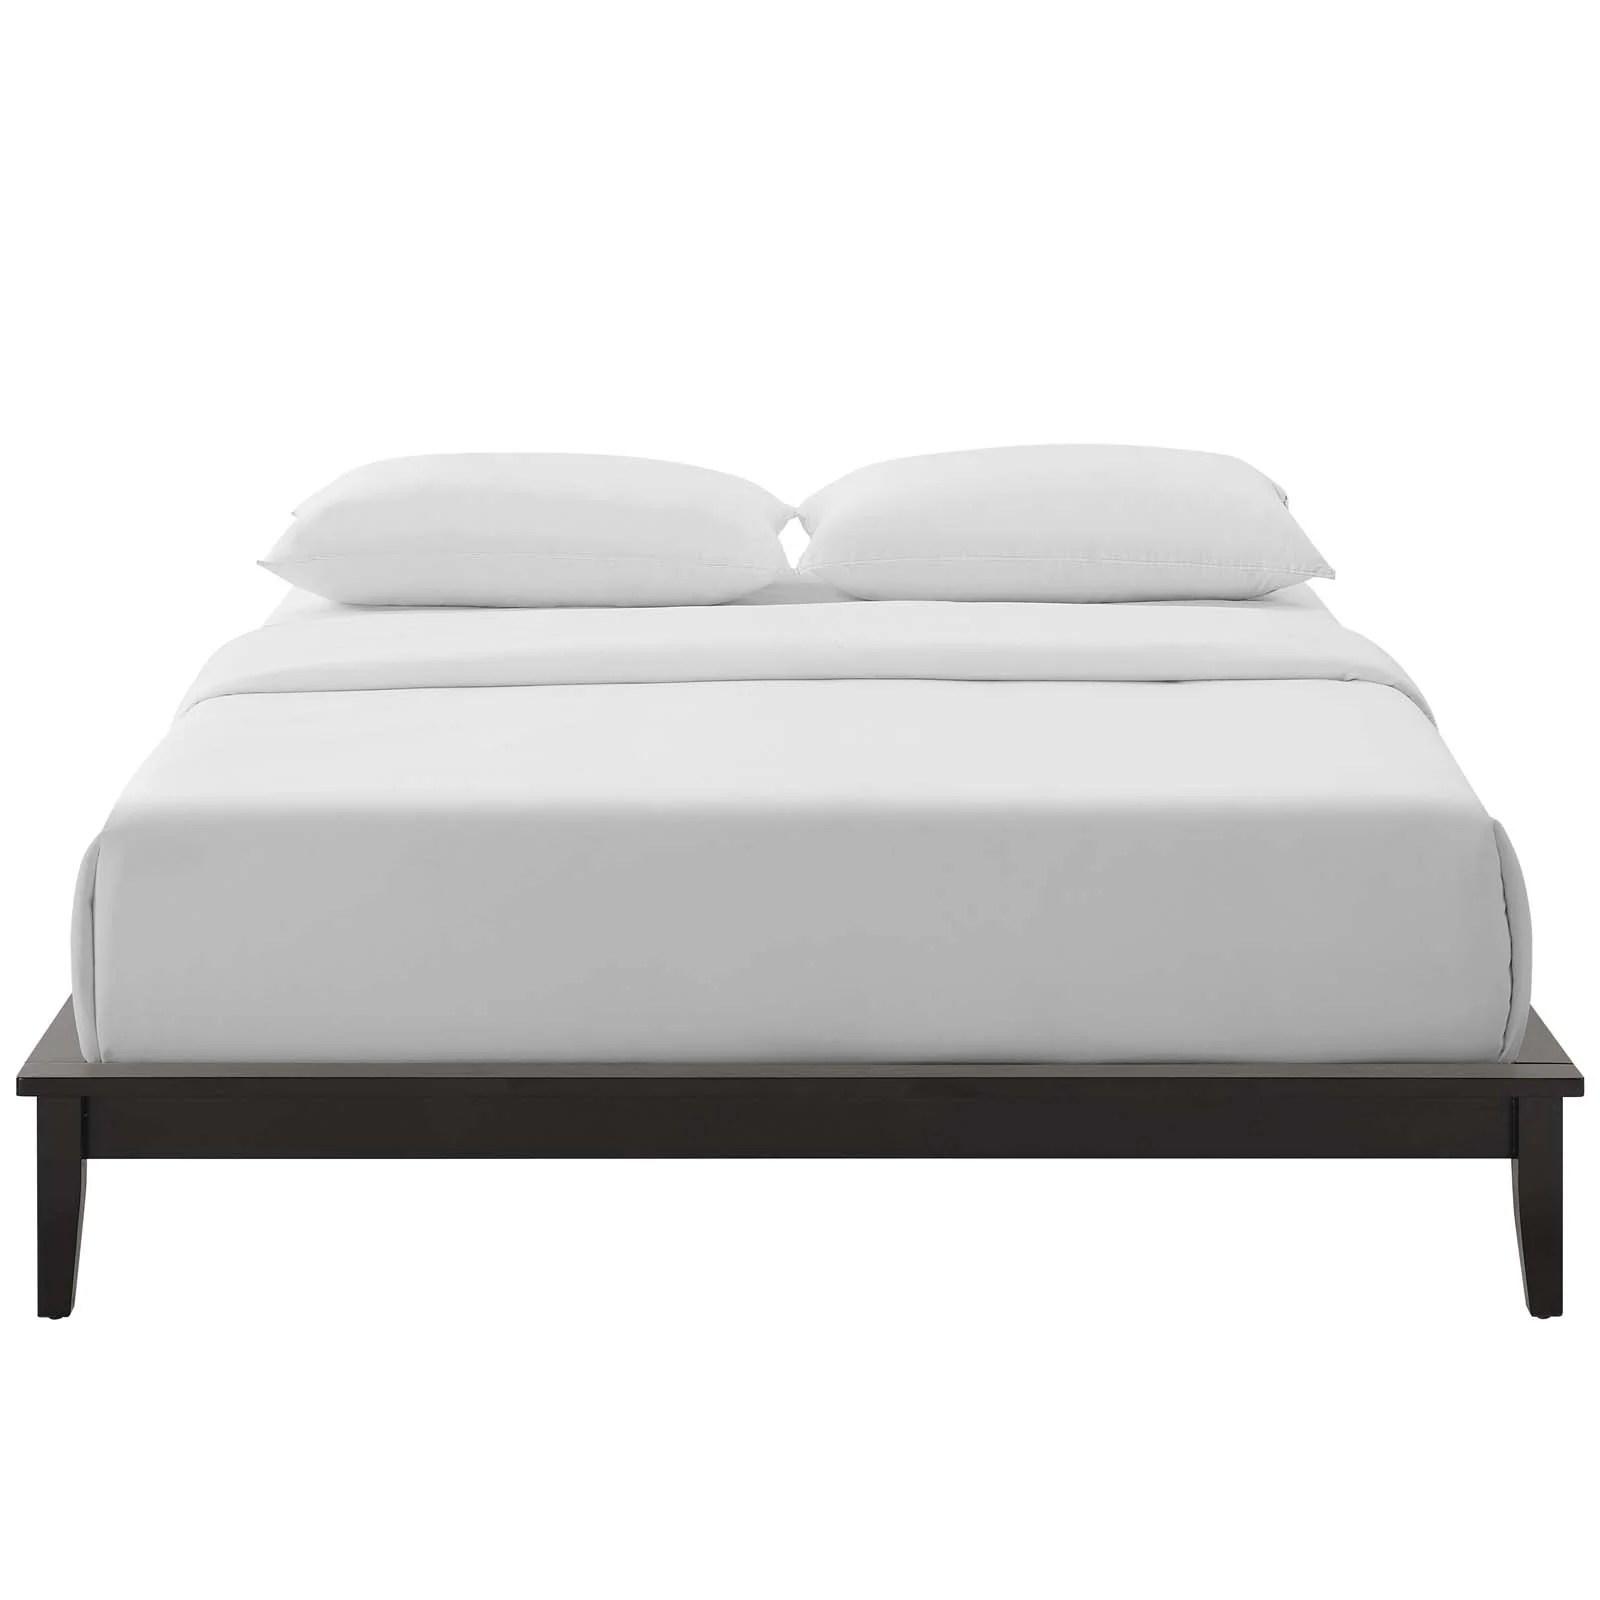 Lodge Full Size Wood Platform Bed Online Interior Design Store And Service Provider